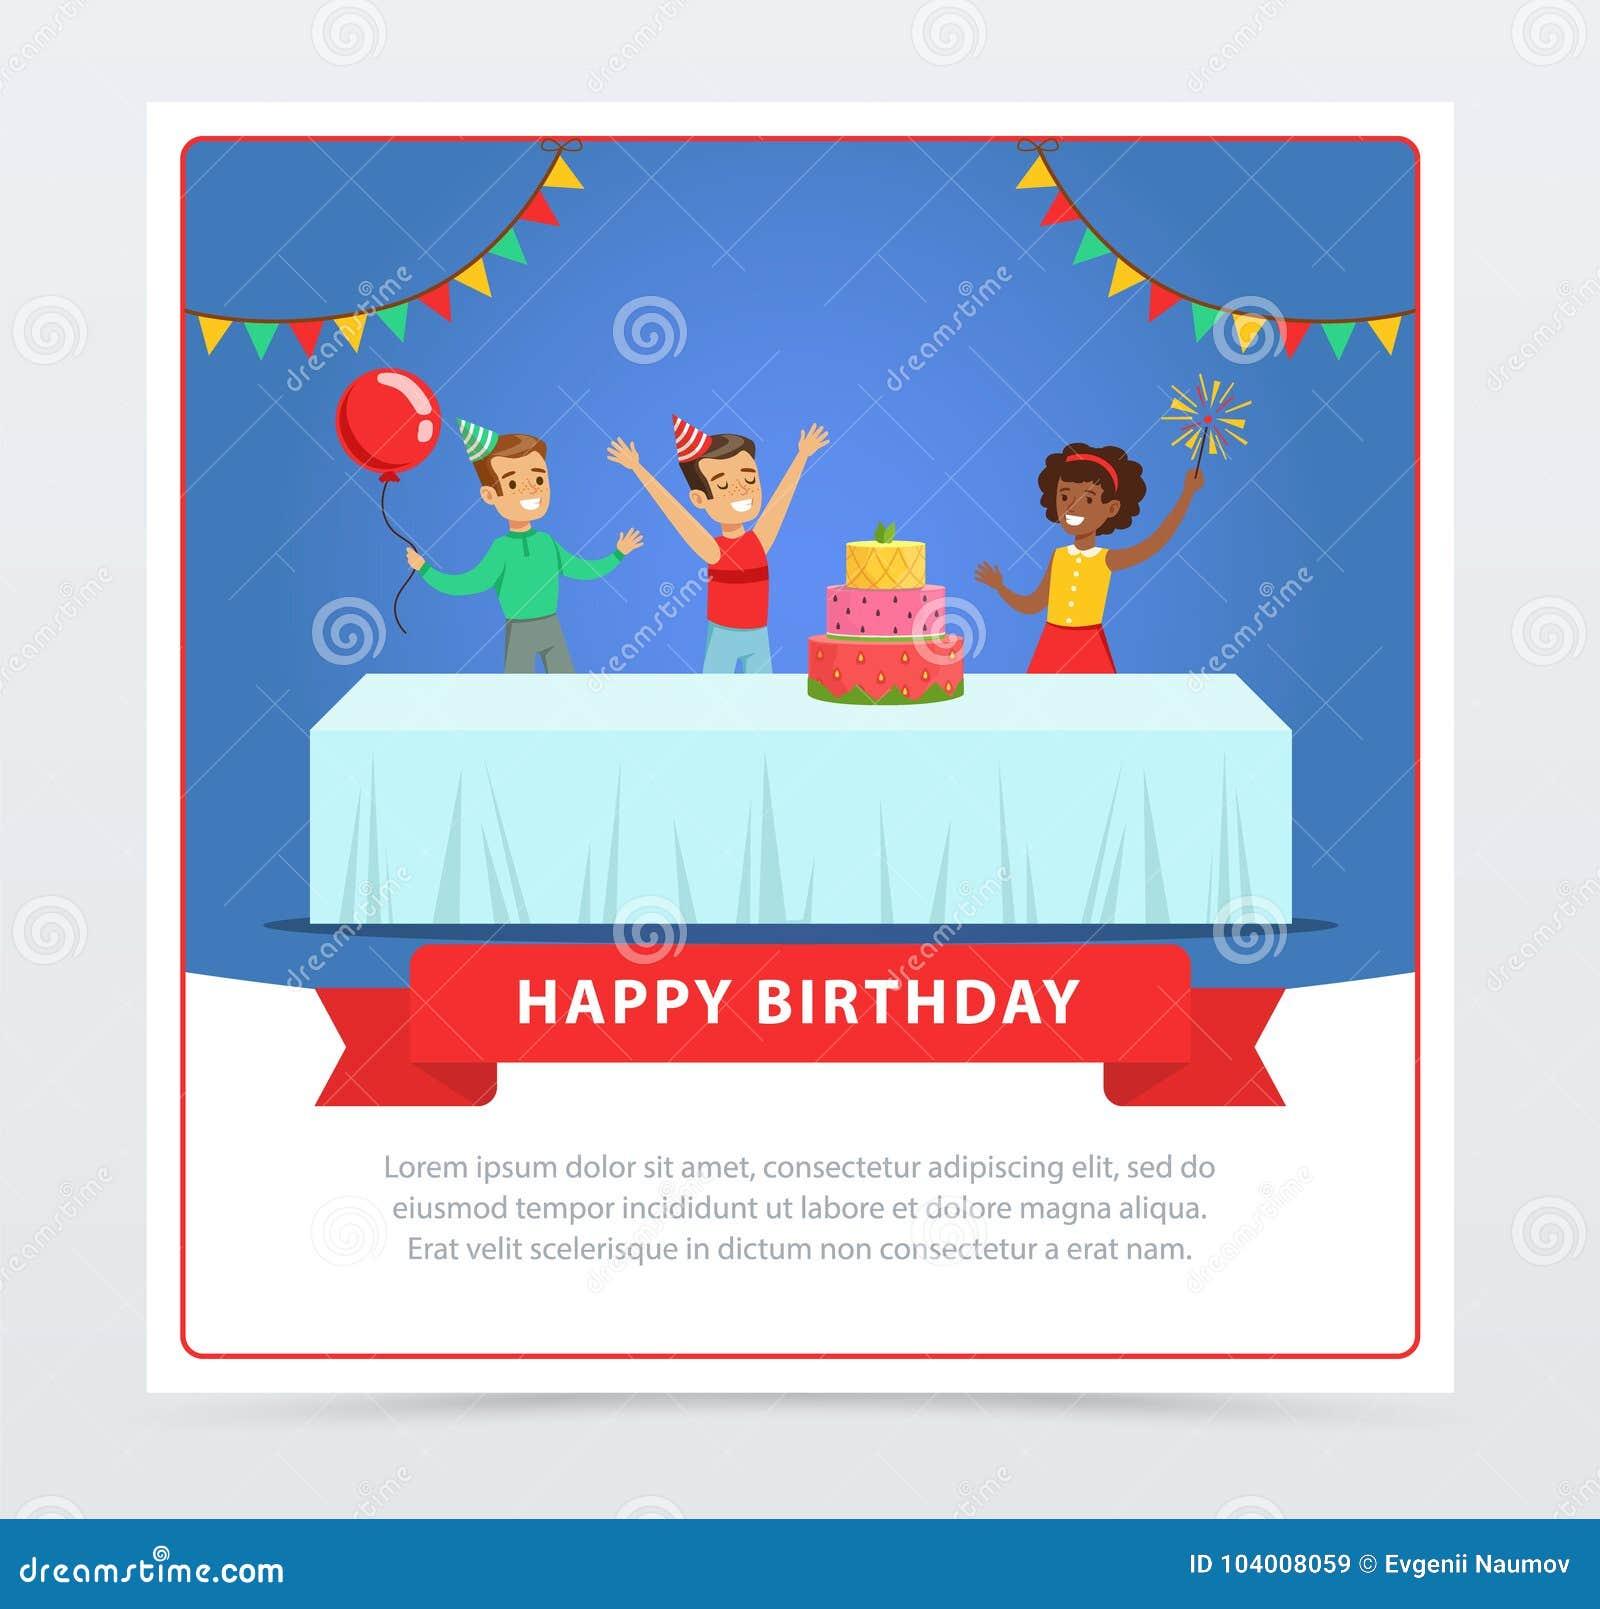 Cute Kids Celebrating Birthday With Cake, Happy Birthday